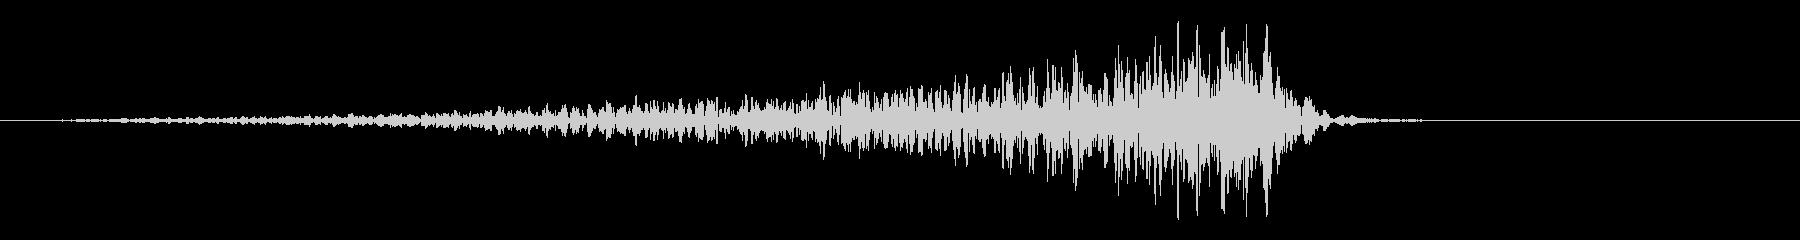 SWELL ディープノイズランブル02の未再生の波形